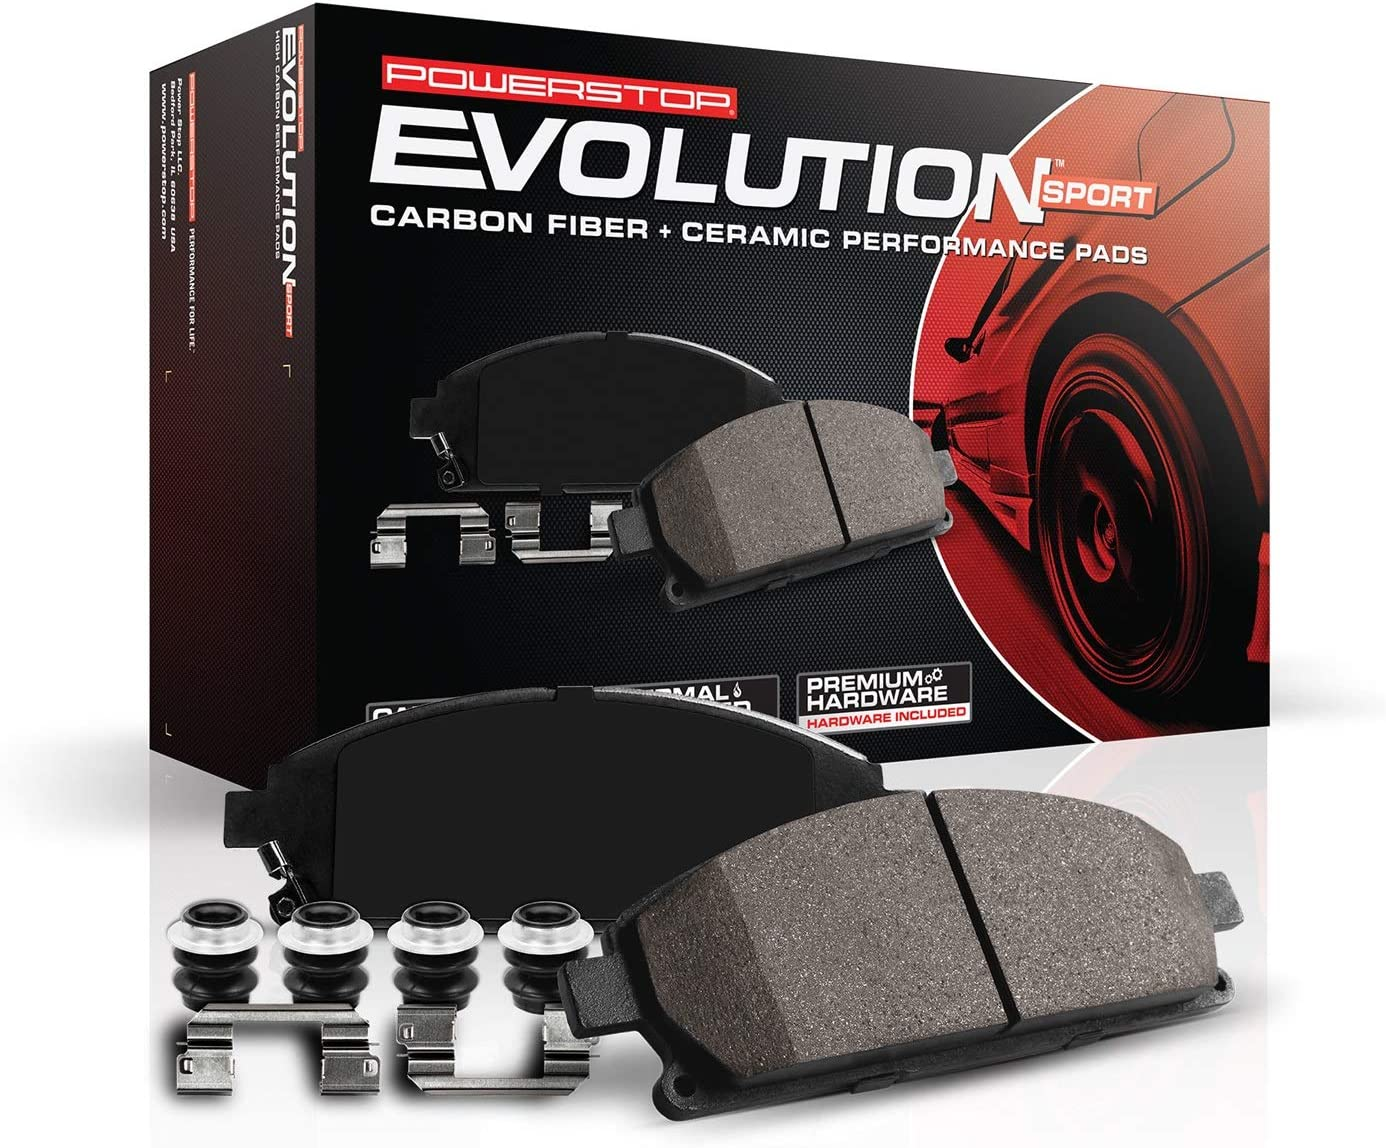 Z23 Evolution Front Carbon-Fiber Ceramic Brake Pads Power Stop Z23-1351